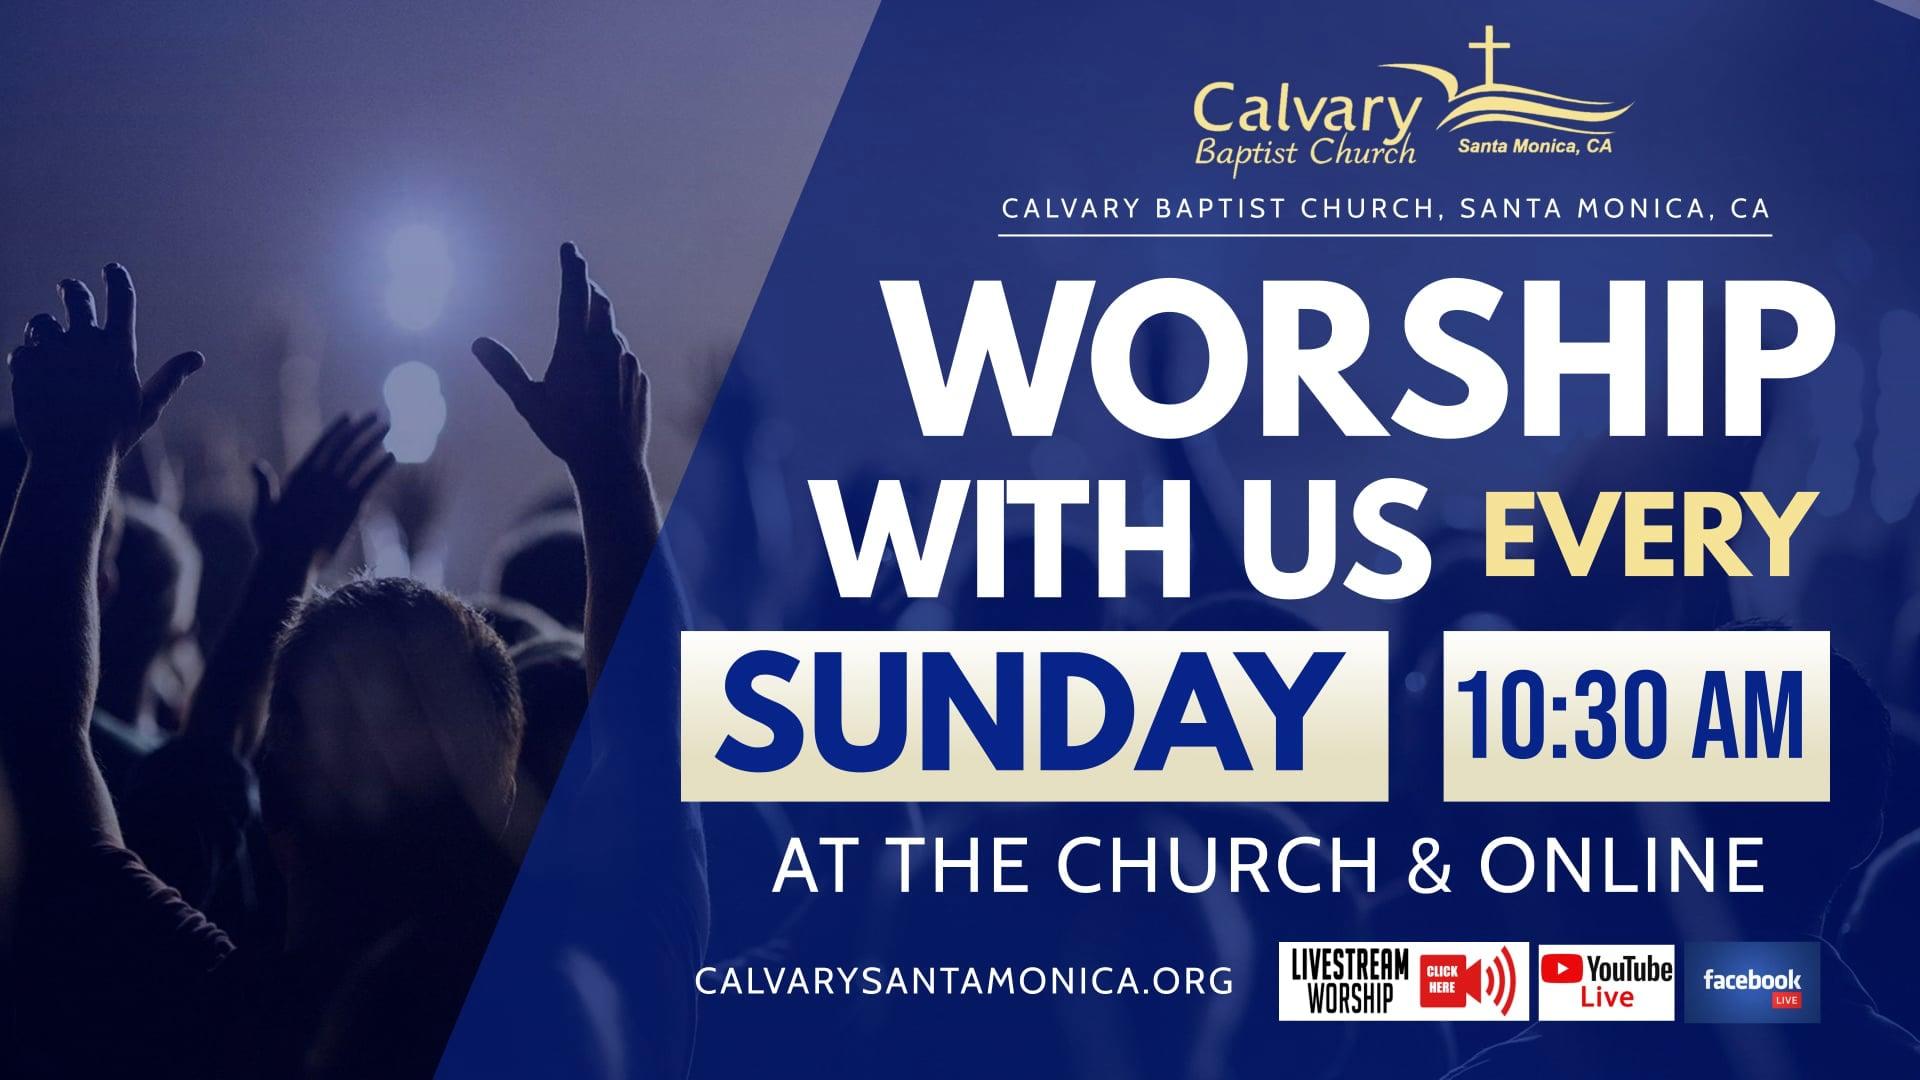 10.10.21 Calvary Baptist Church Worship Service